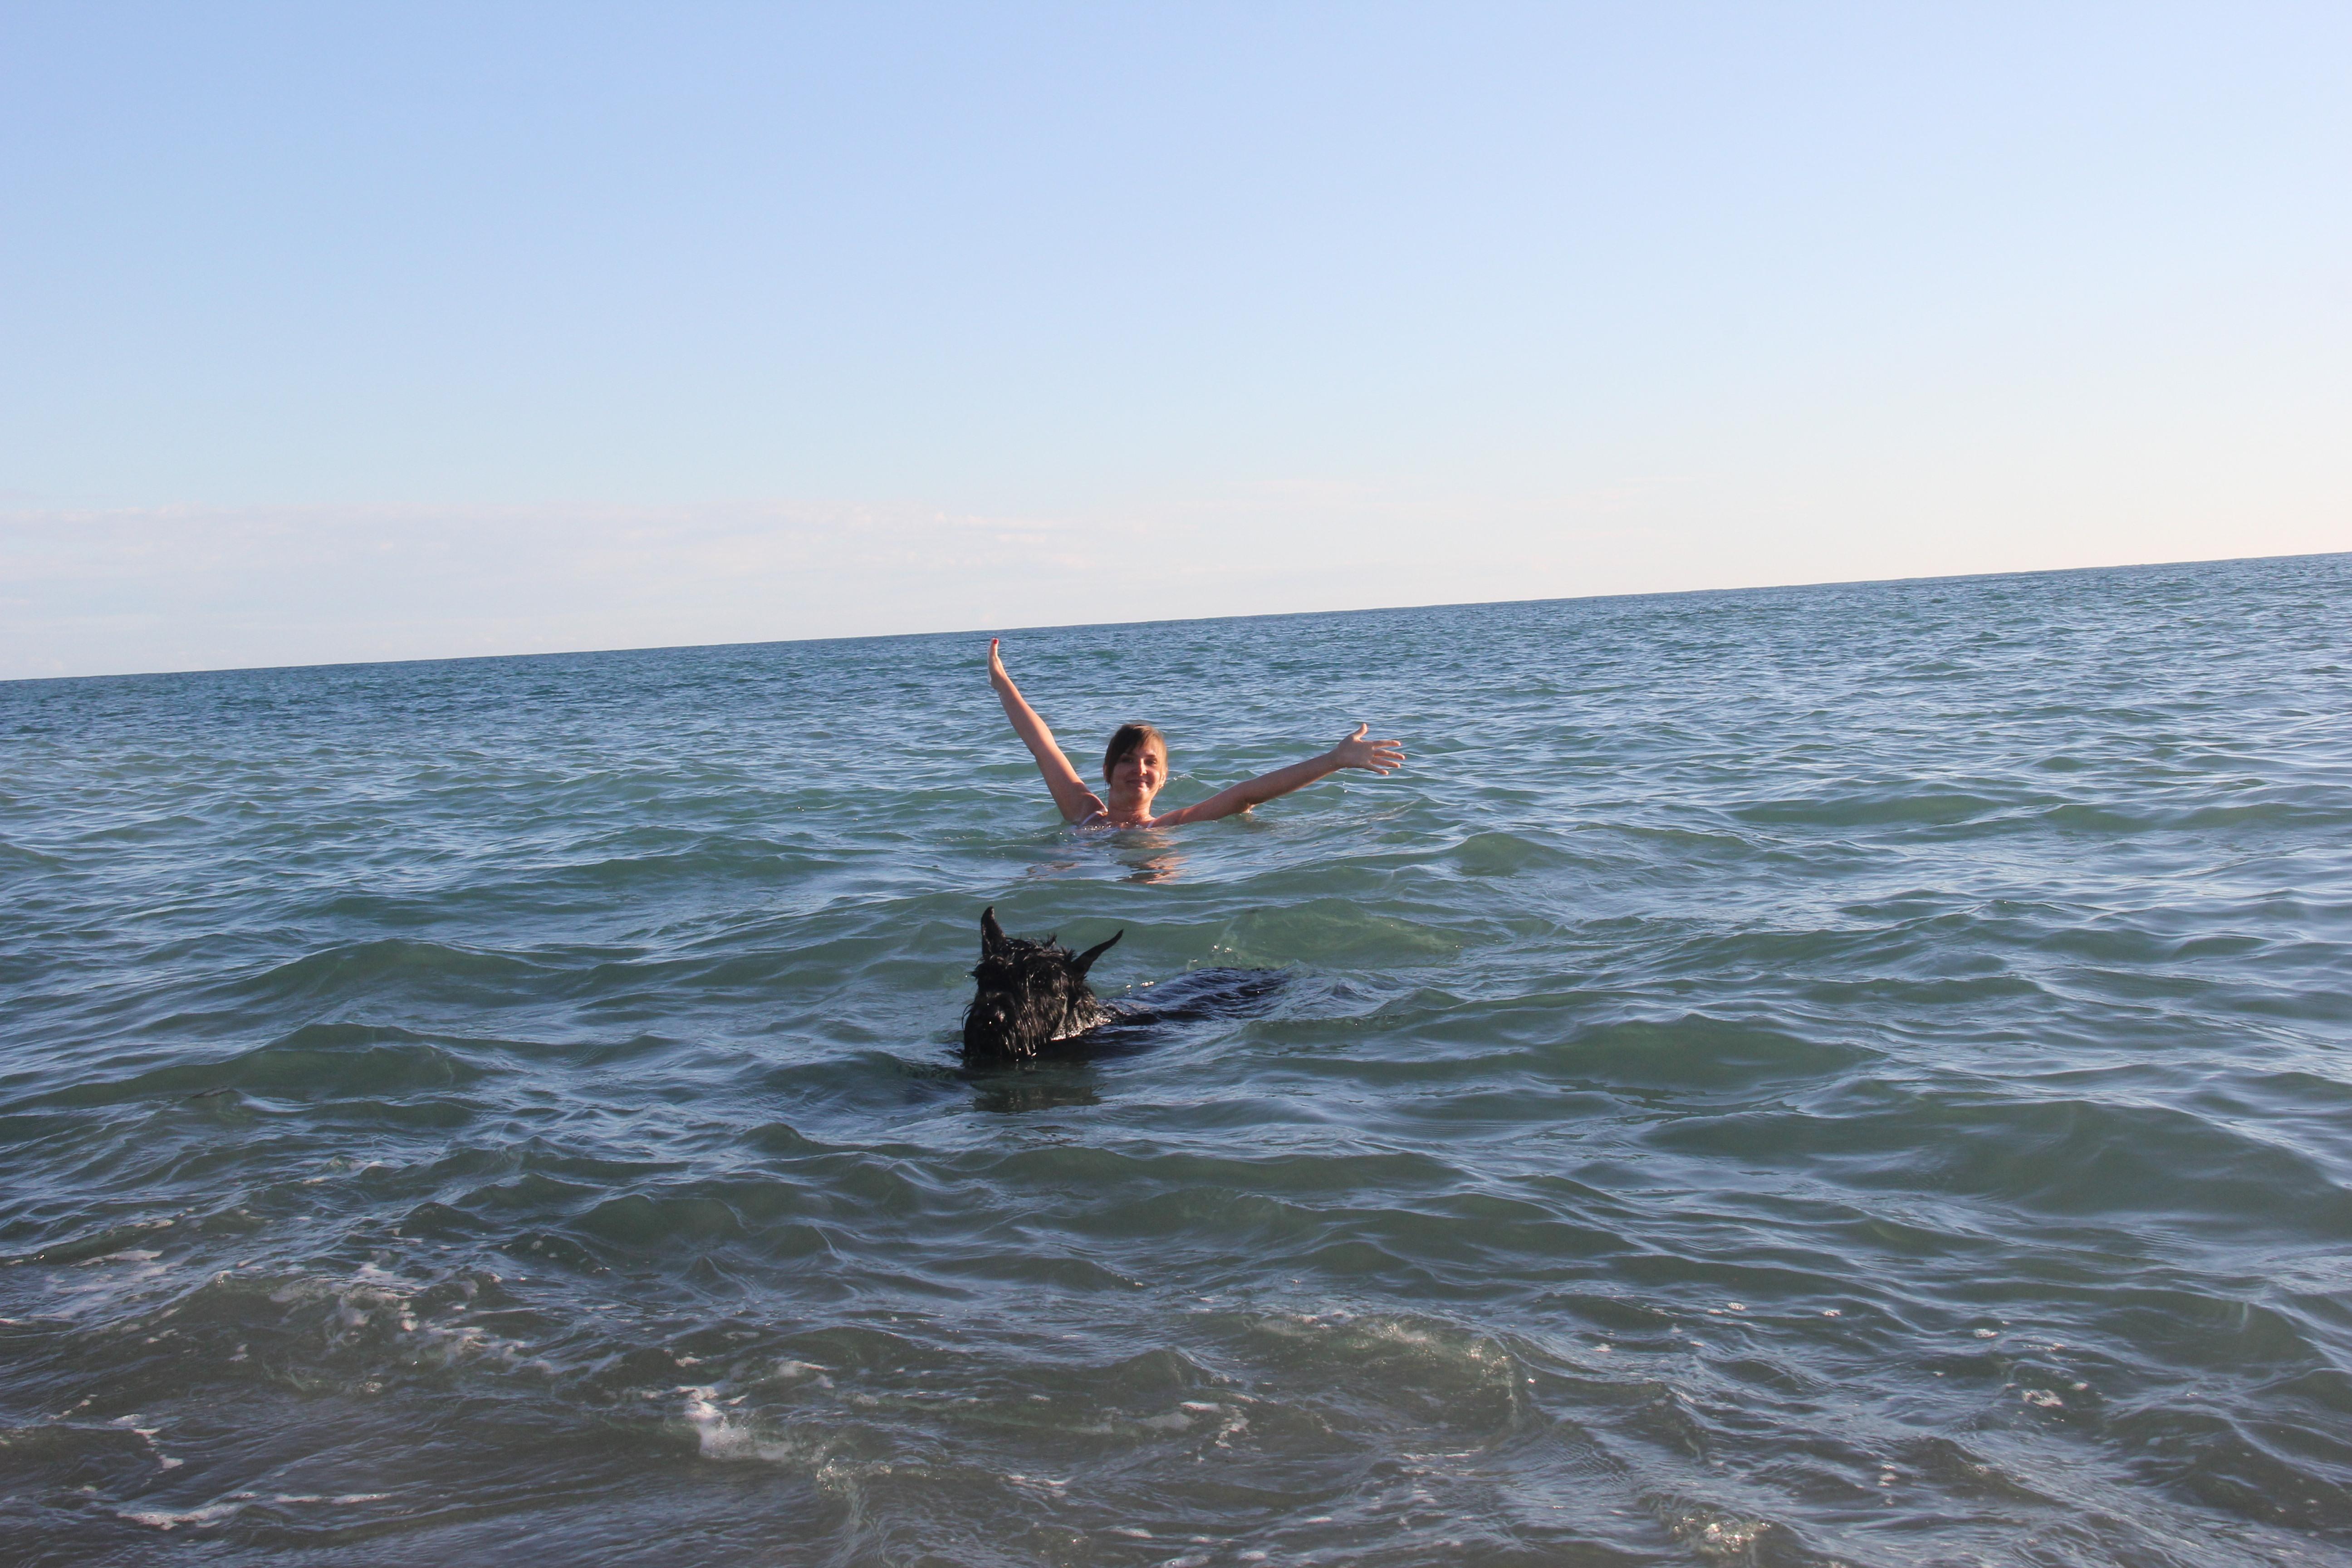 Гара на Черном море, сентябрь 2014